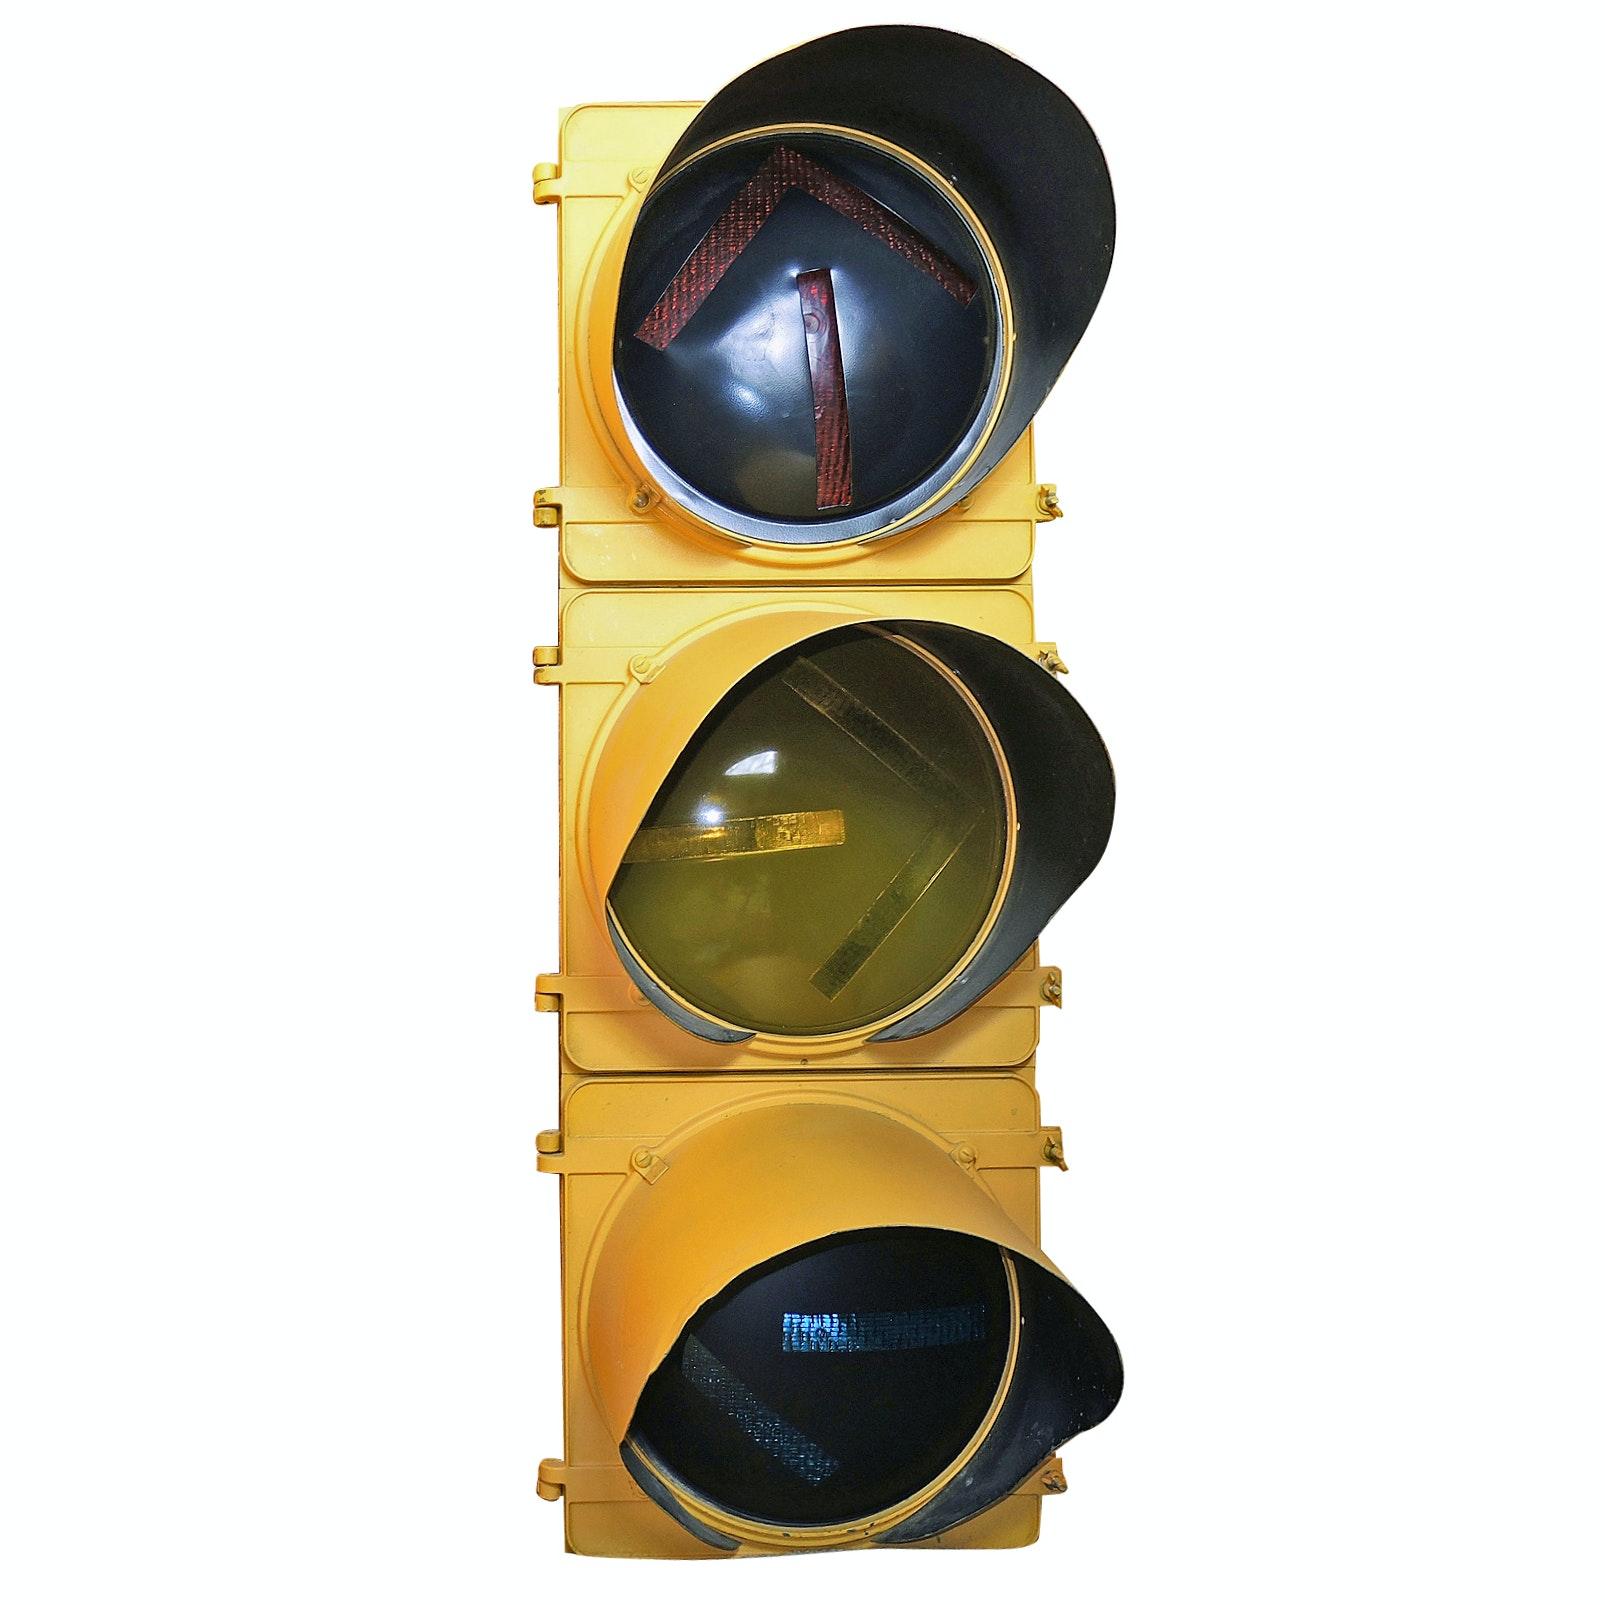 Automatic Traffic Signal Light